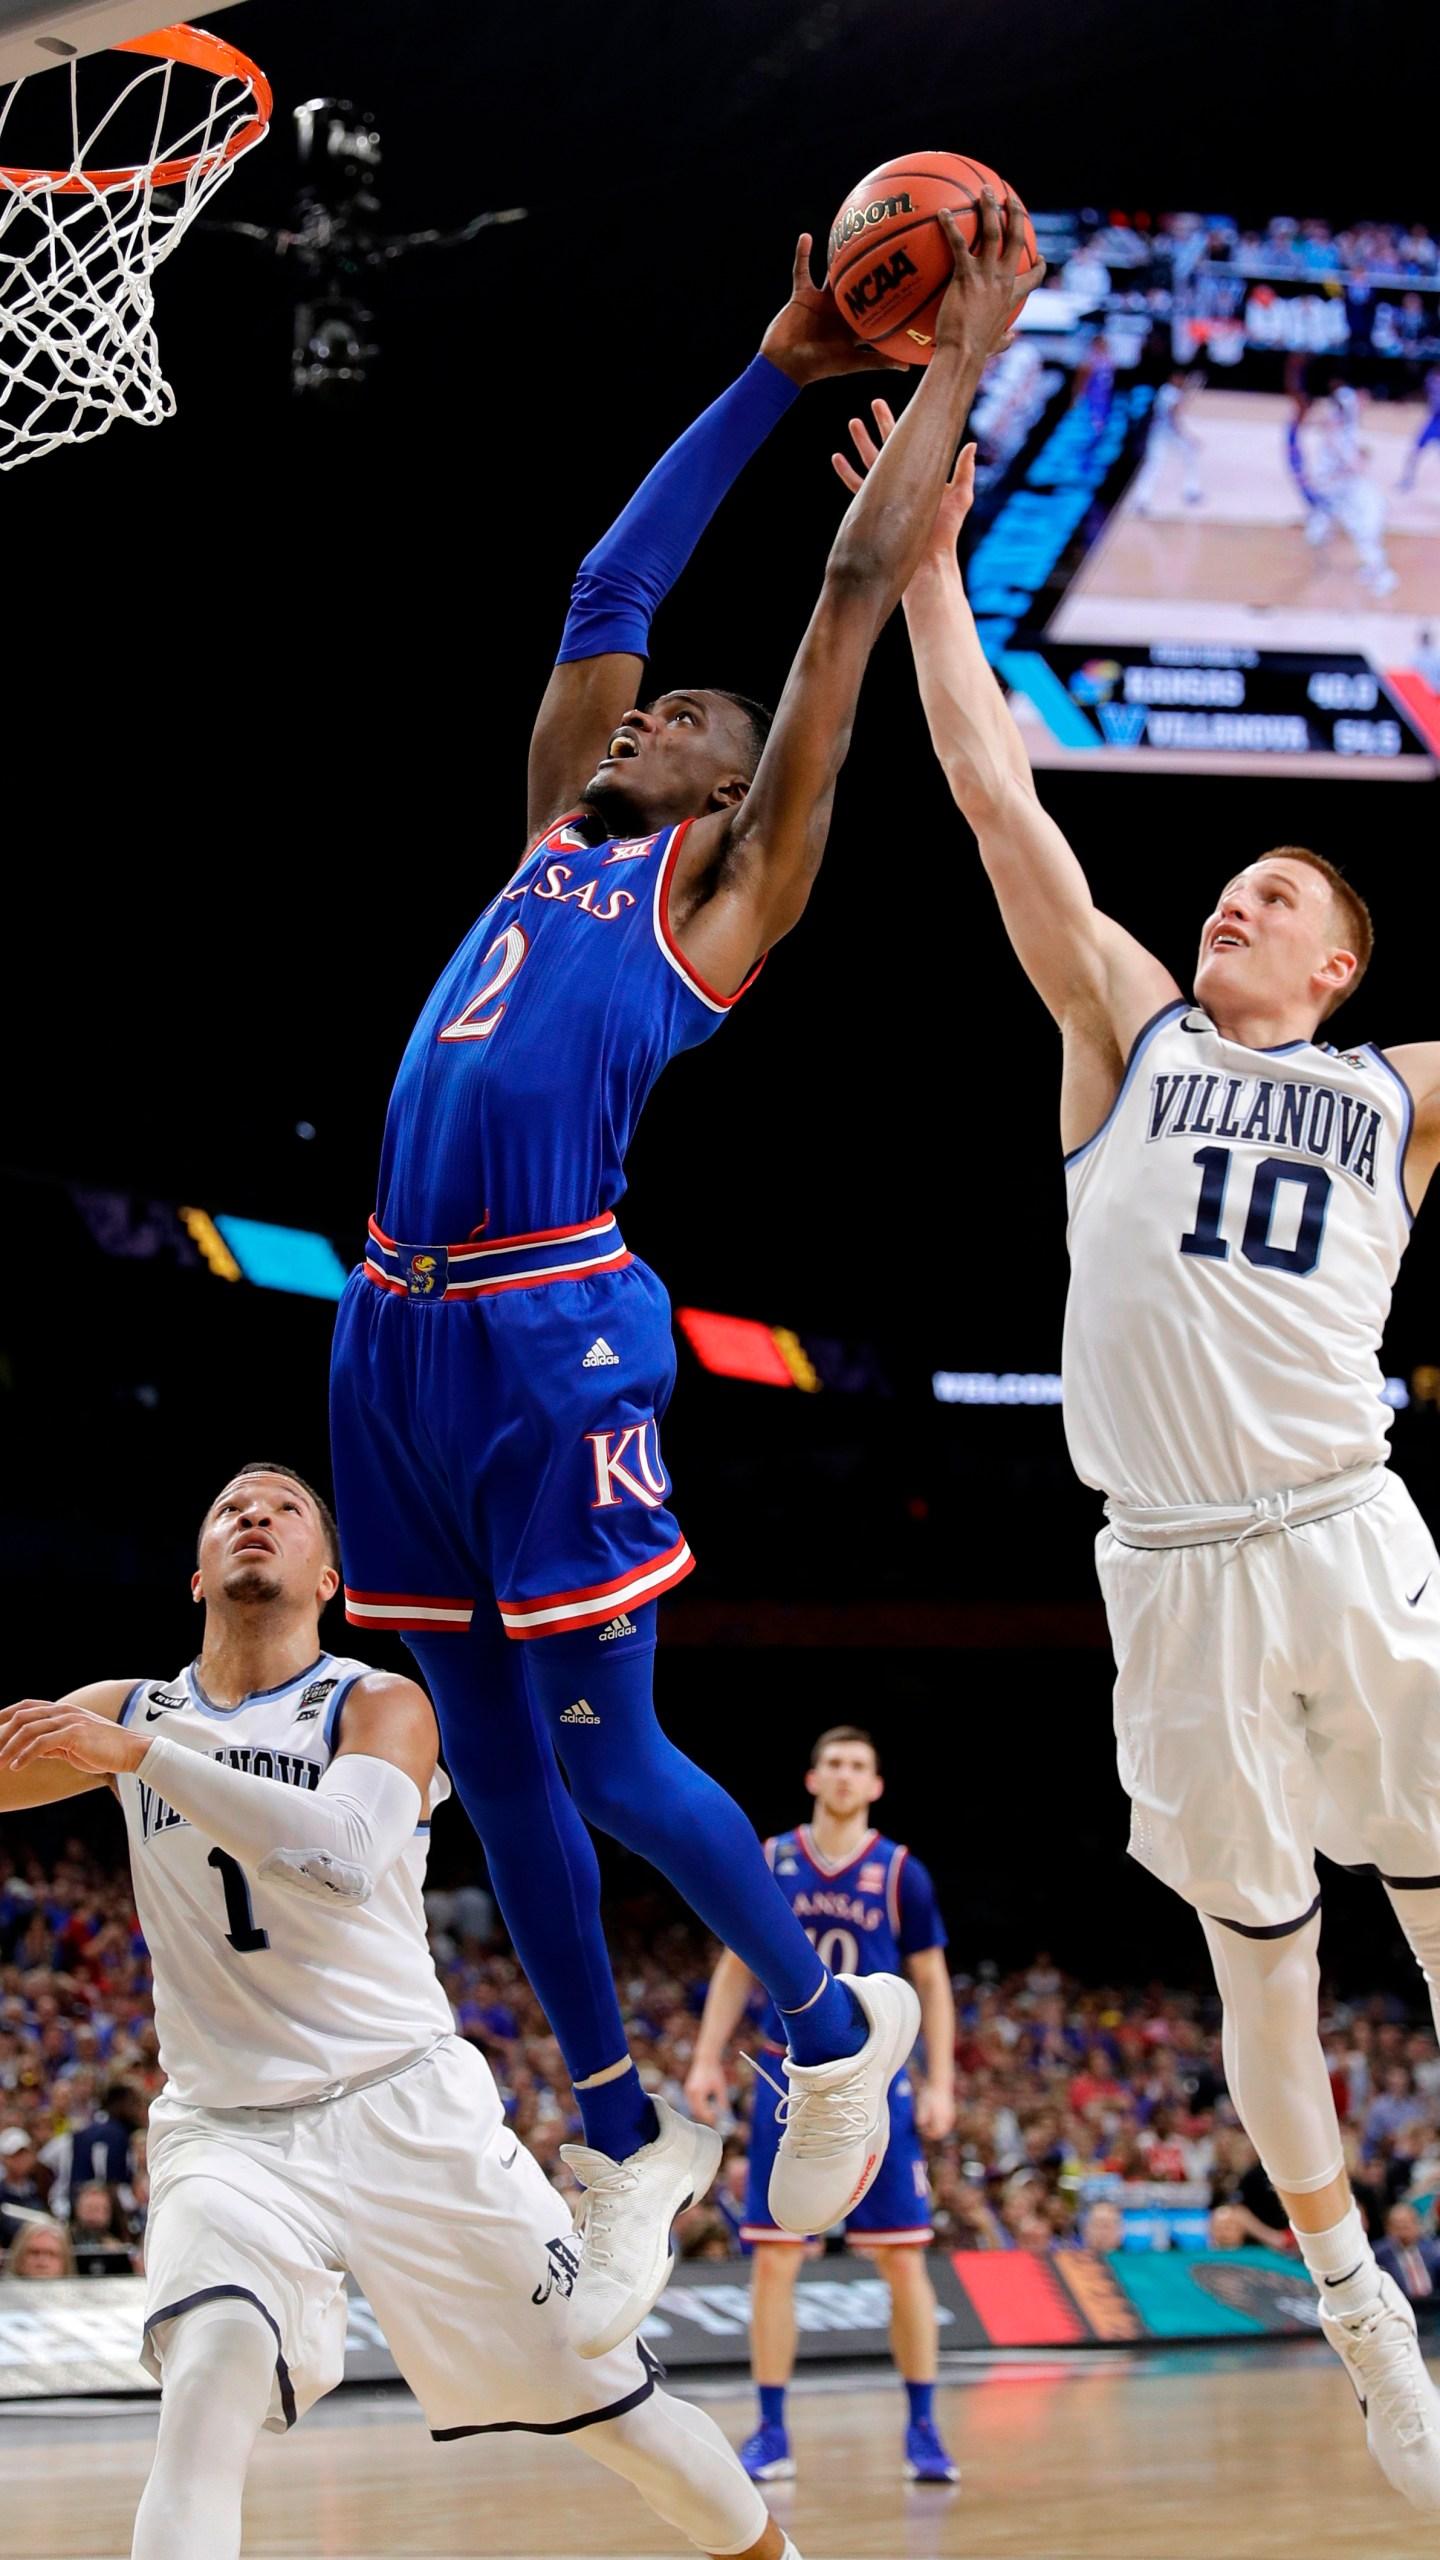 Final Four Kansas Villanova Basketball_1530323233640